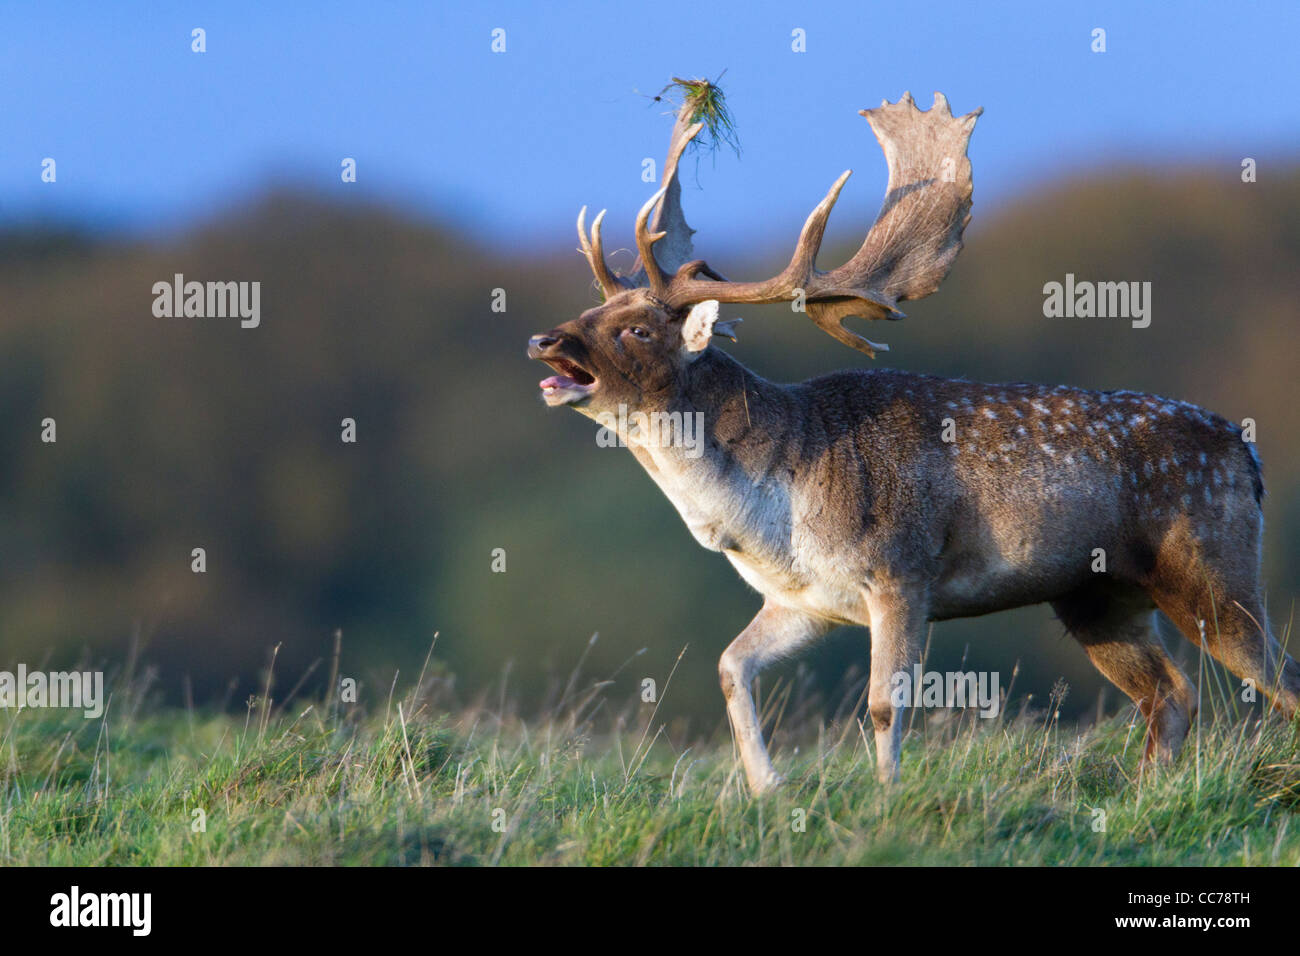 Fallow Deer (Dama dama), Buck Roaring during the Rut, Royal Deer Park, Klampenborg, Copenhagen, Sjaelland, Denmark - Stock Image